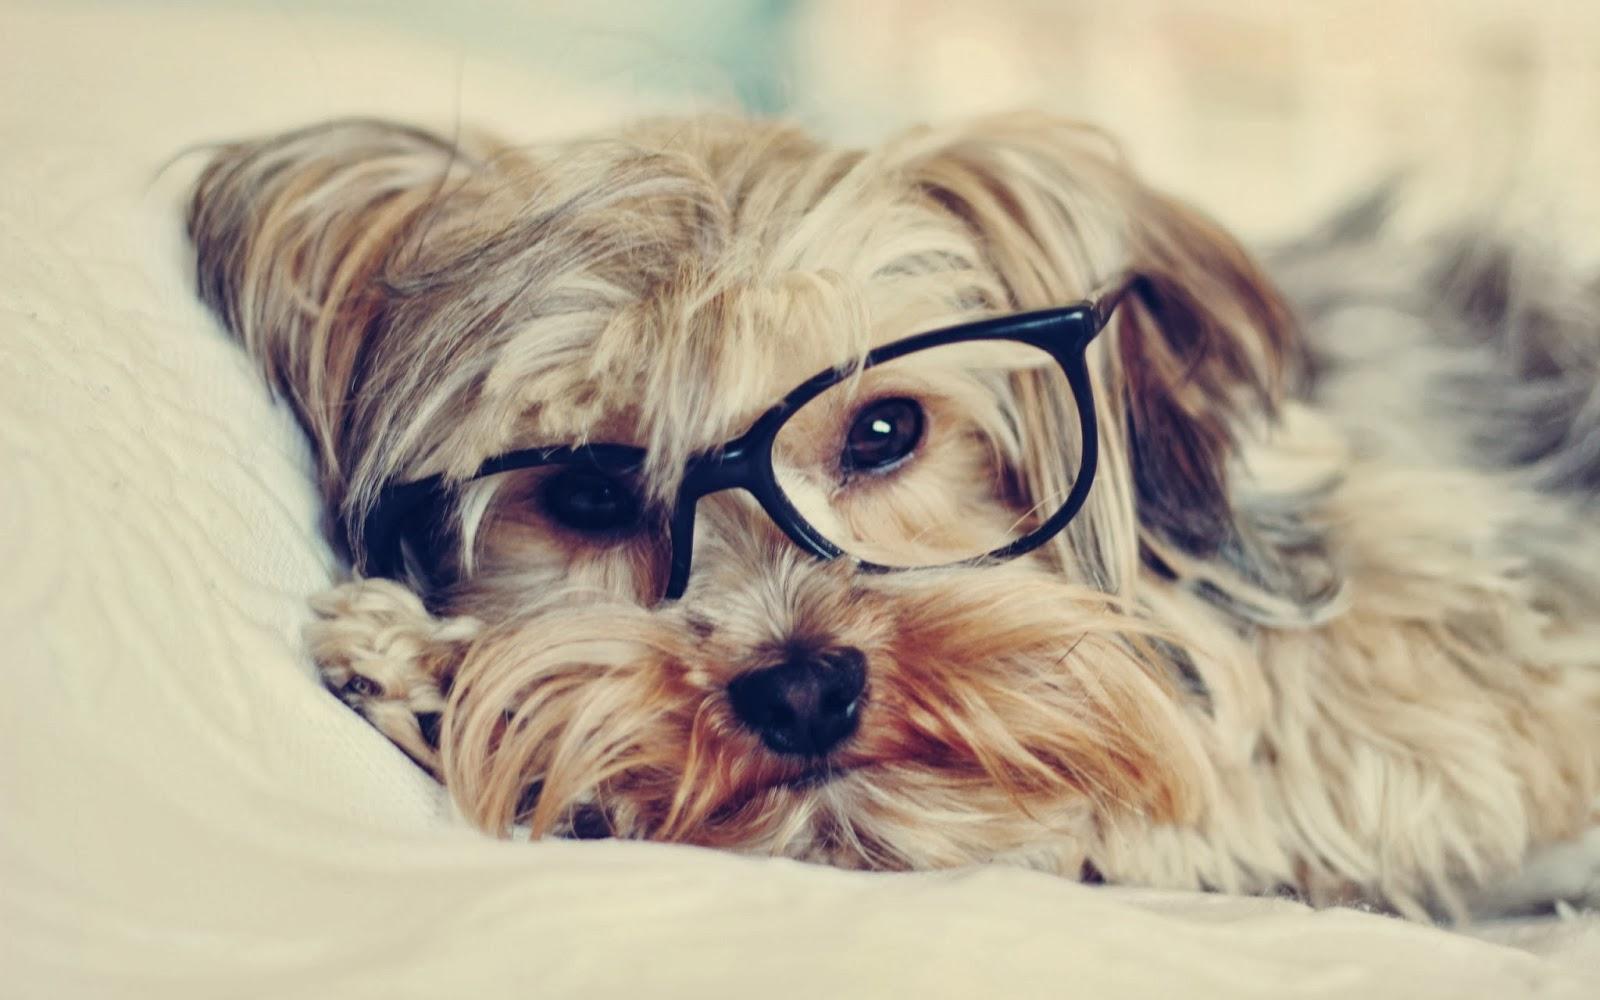 lucu-anjing-dengan-kacamata-foto-wallpaper-2560x1600